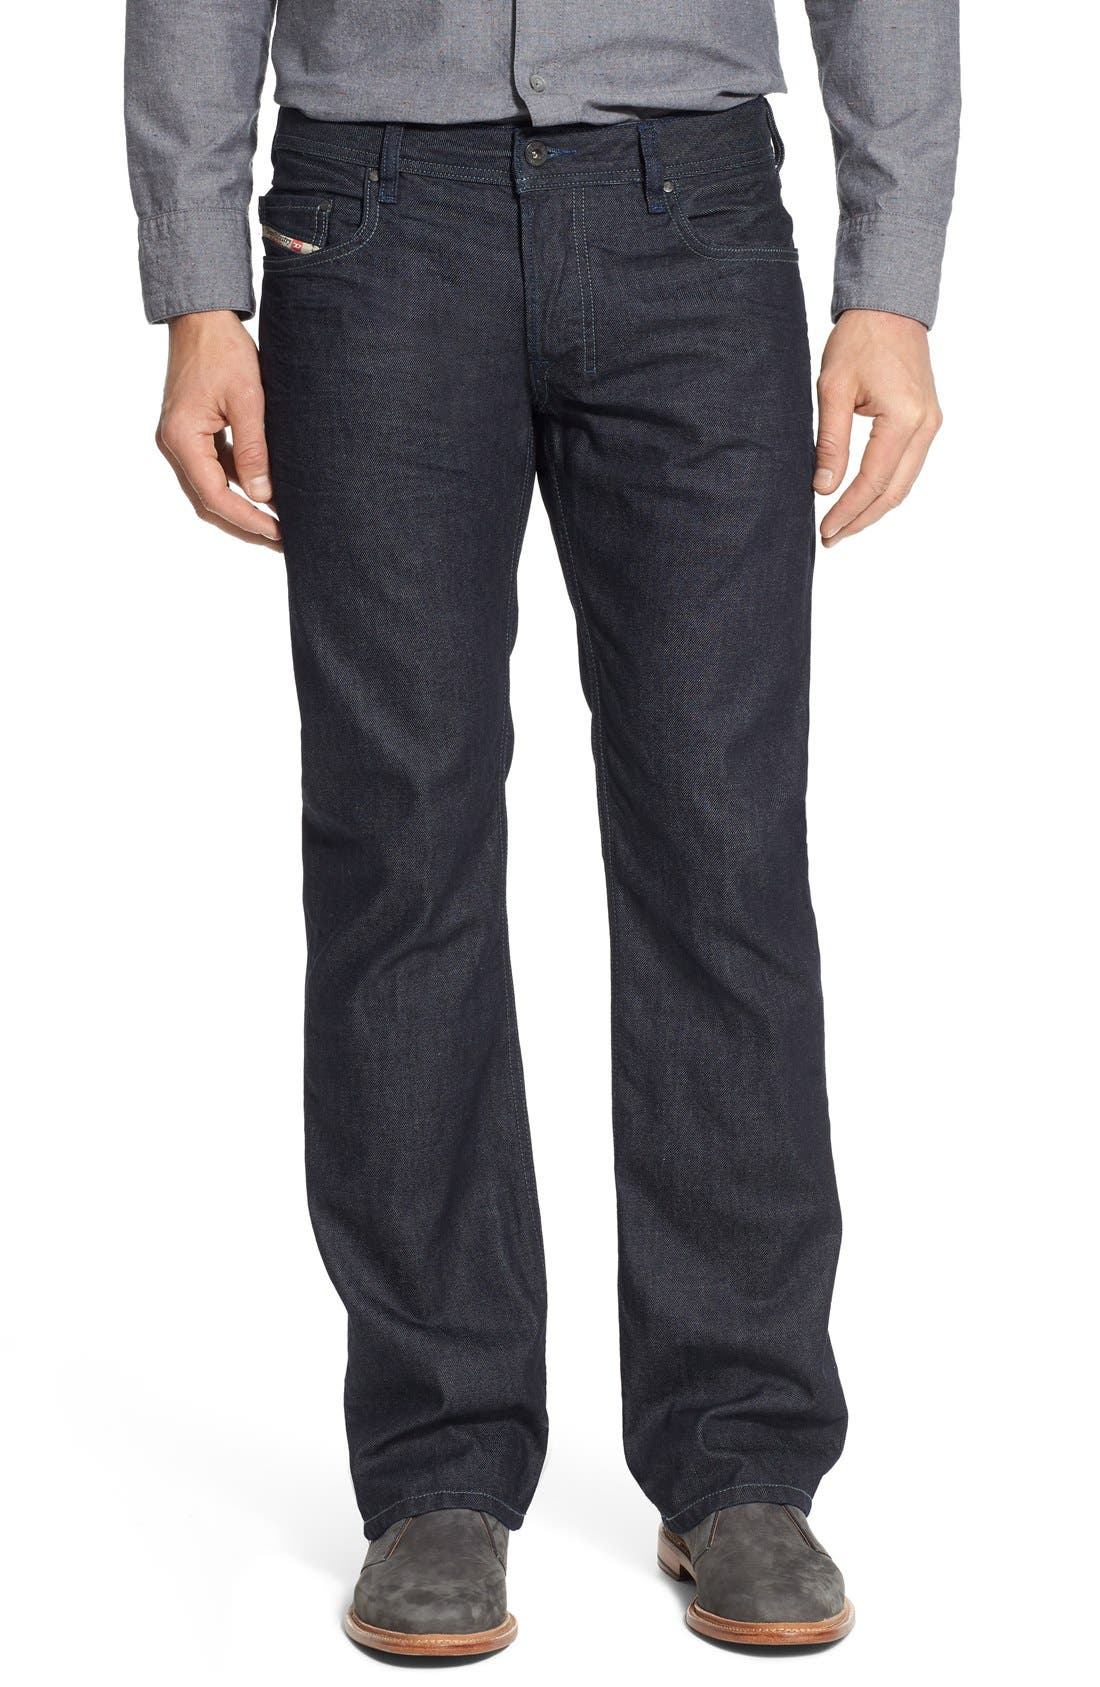 DIESELR Men's Diesel Zatiny Bootcut Jeans